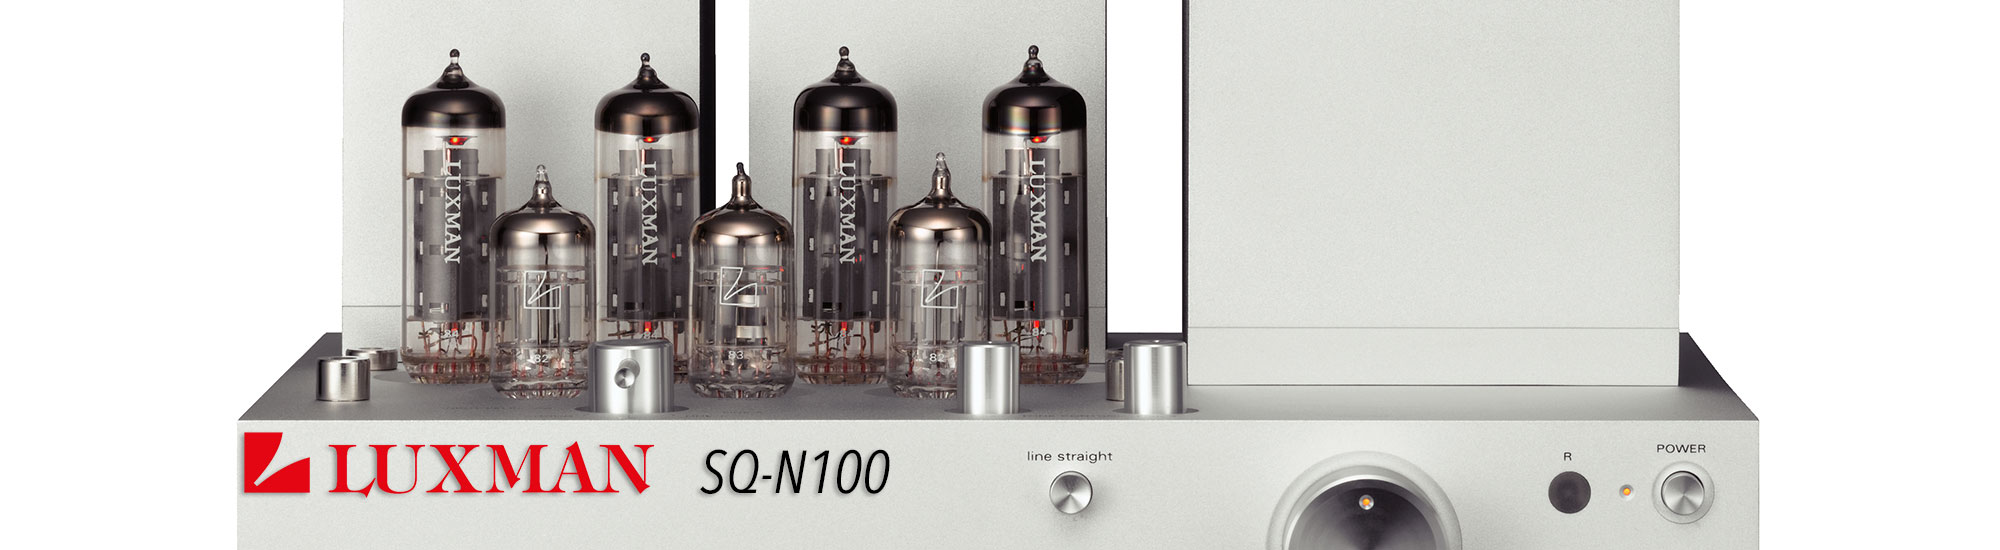 Luxman SQ-N100 vacuum tube integrated amp